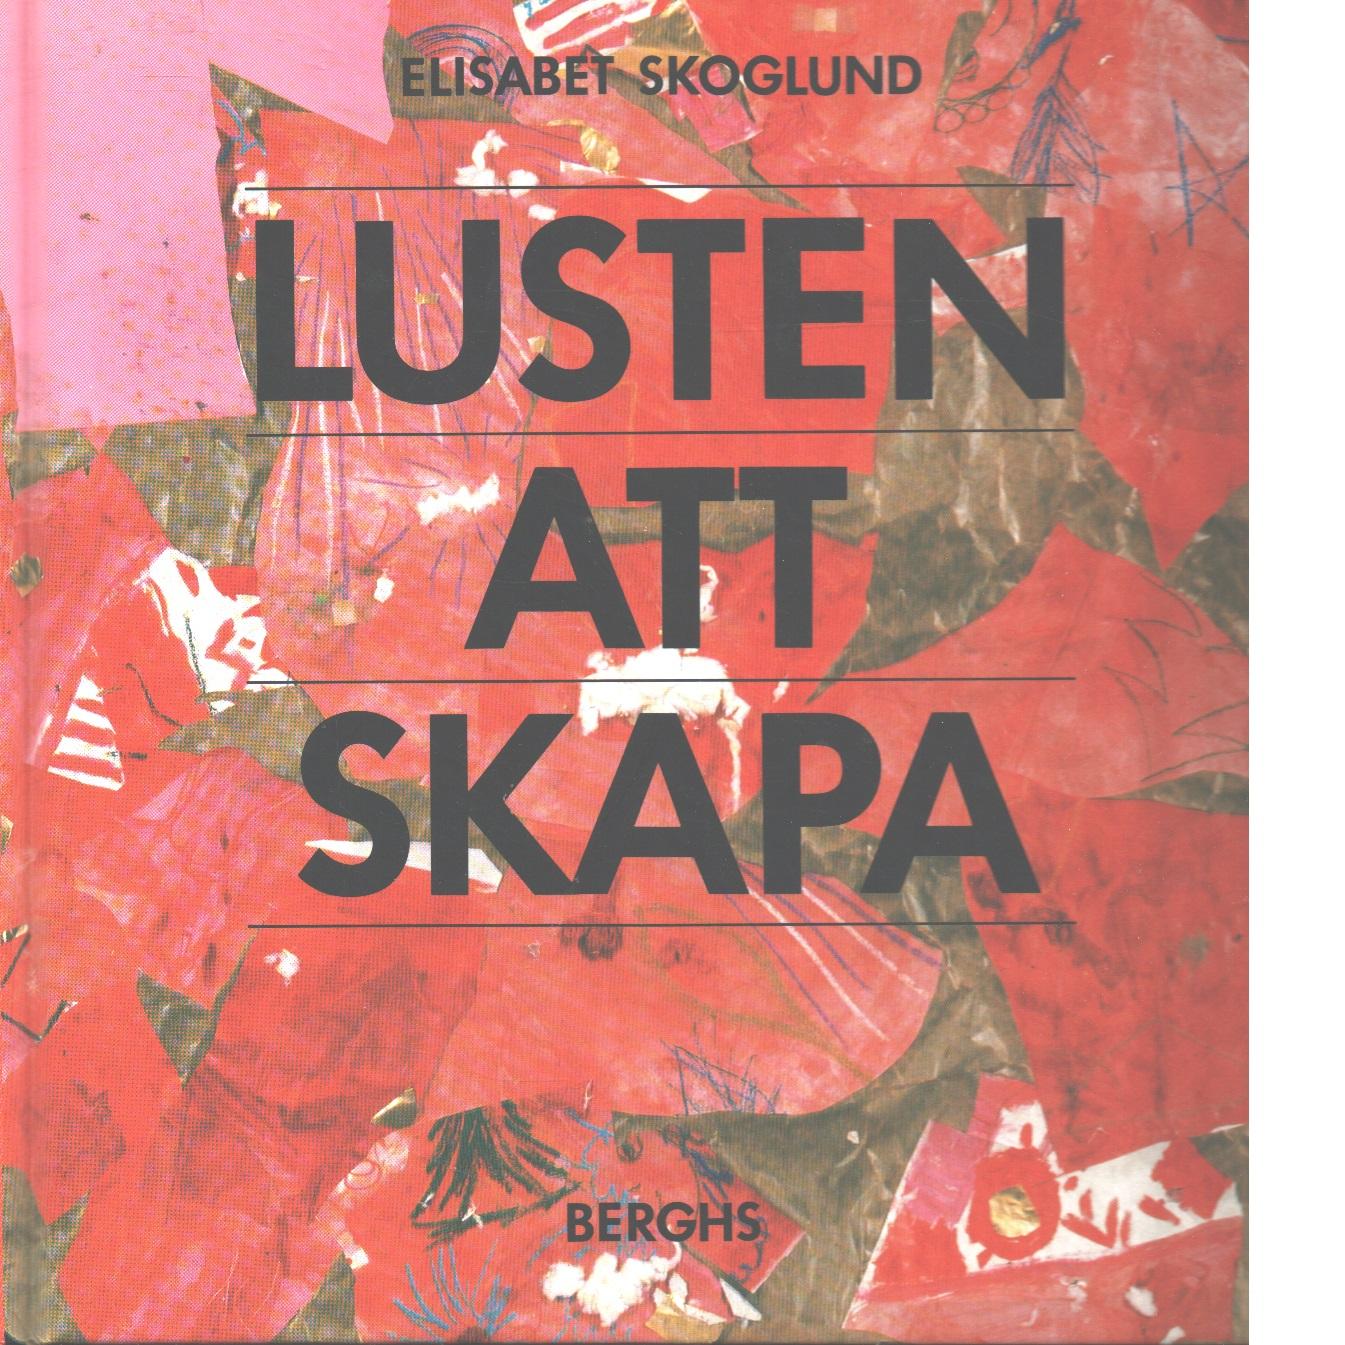 Lusten att skapa - Skoglund, Elisabet